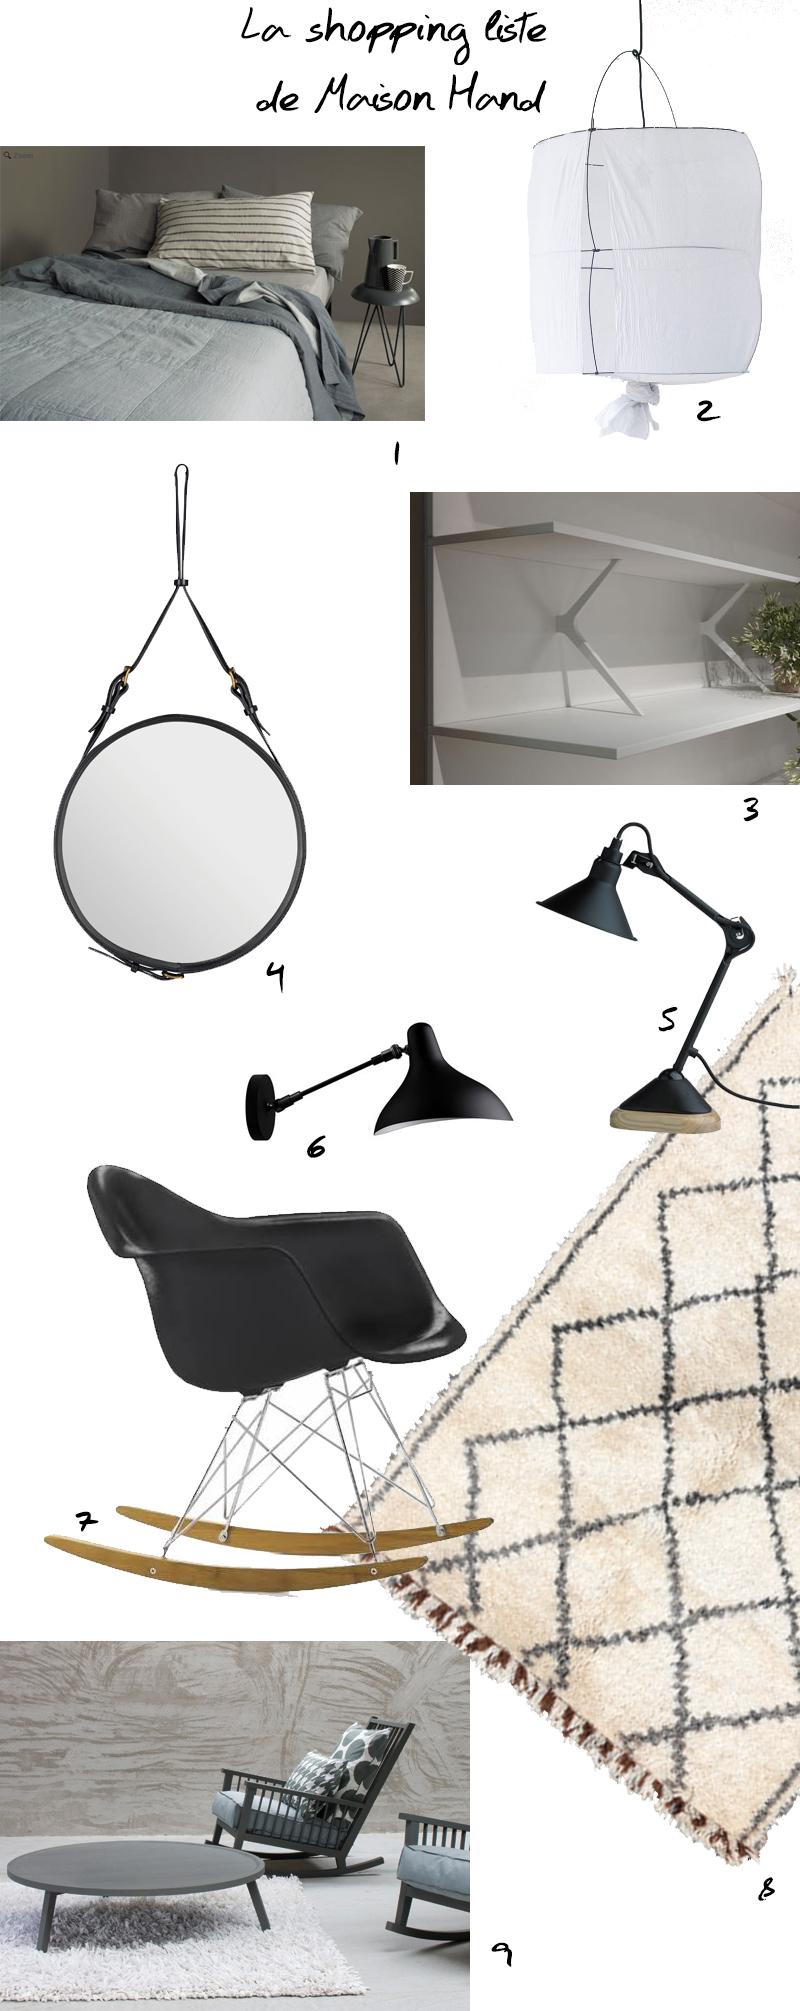 shopping liste maison hand with liste maison. Black Bedroom Furniture Sets. Home Design Ideas